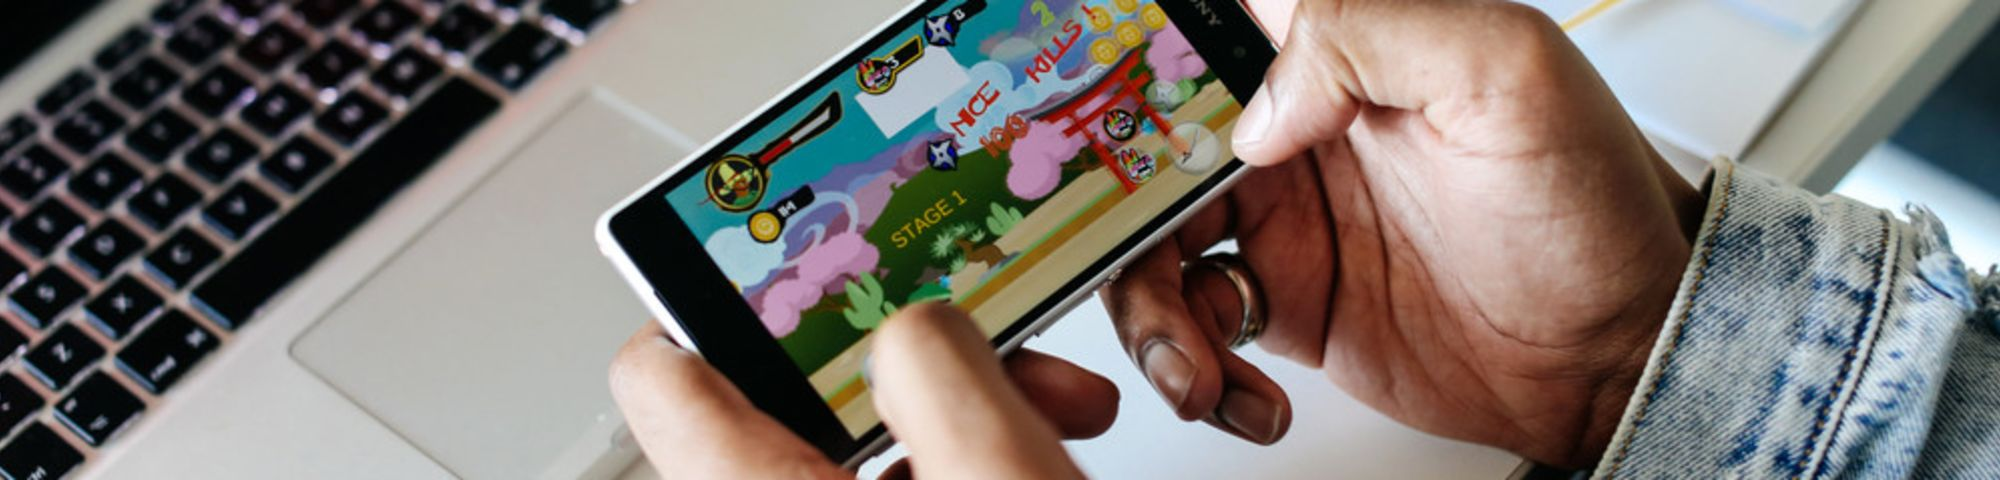 Game Design Subject Child Image